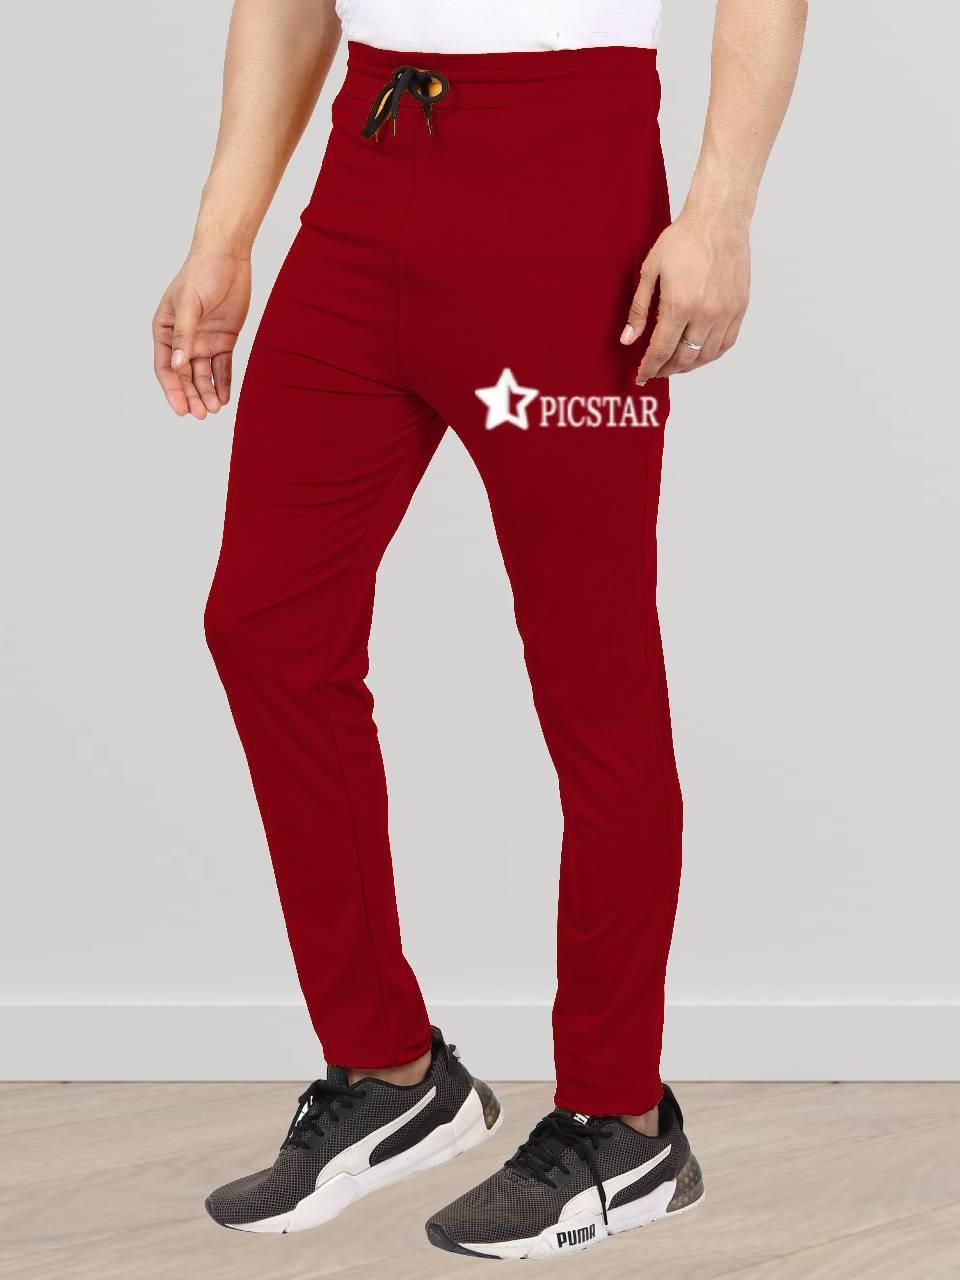 Picstar | Picstar Fox Red Men's Trackpant